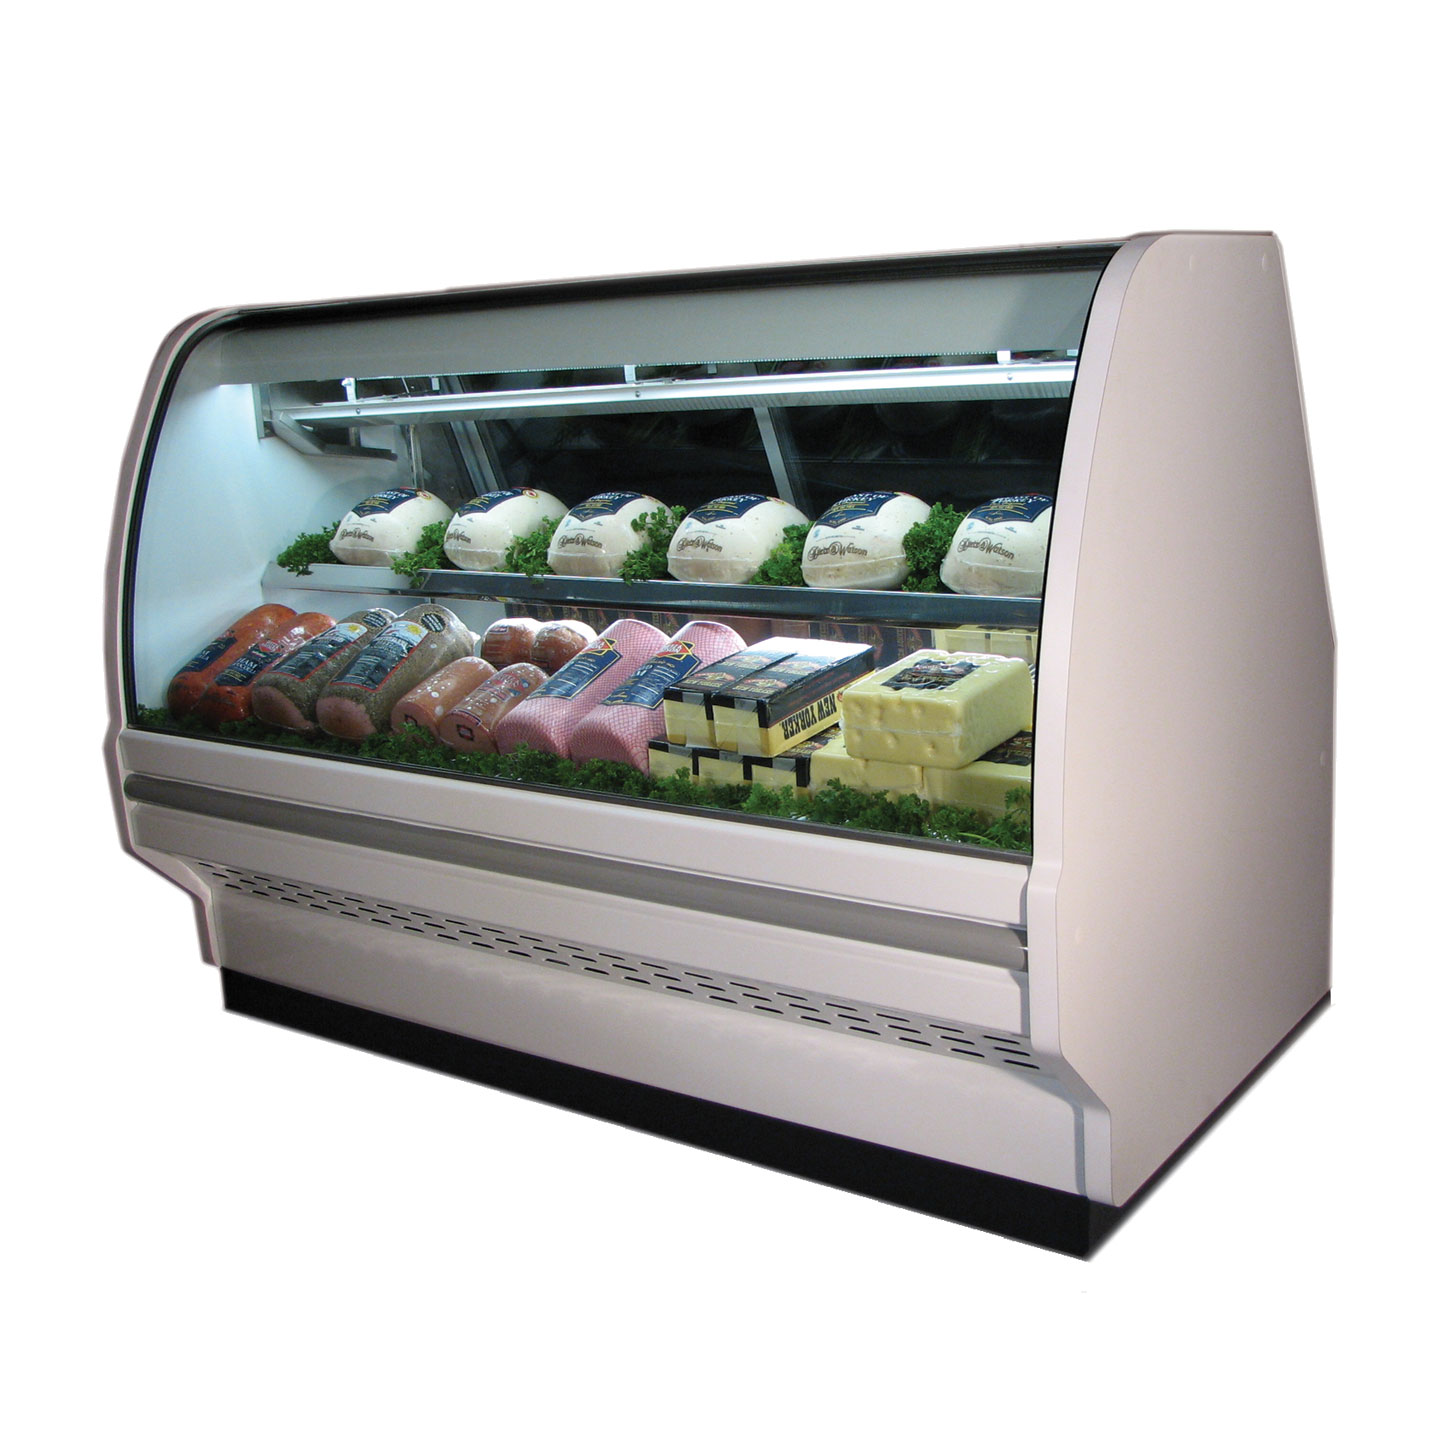 Howard-McCray SC-CDS40E-4C-LED display case, refrigerated deli